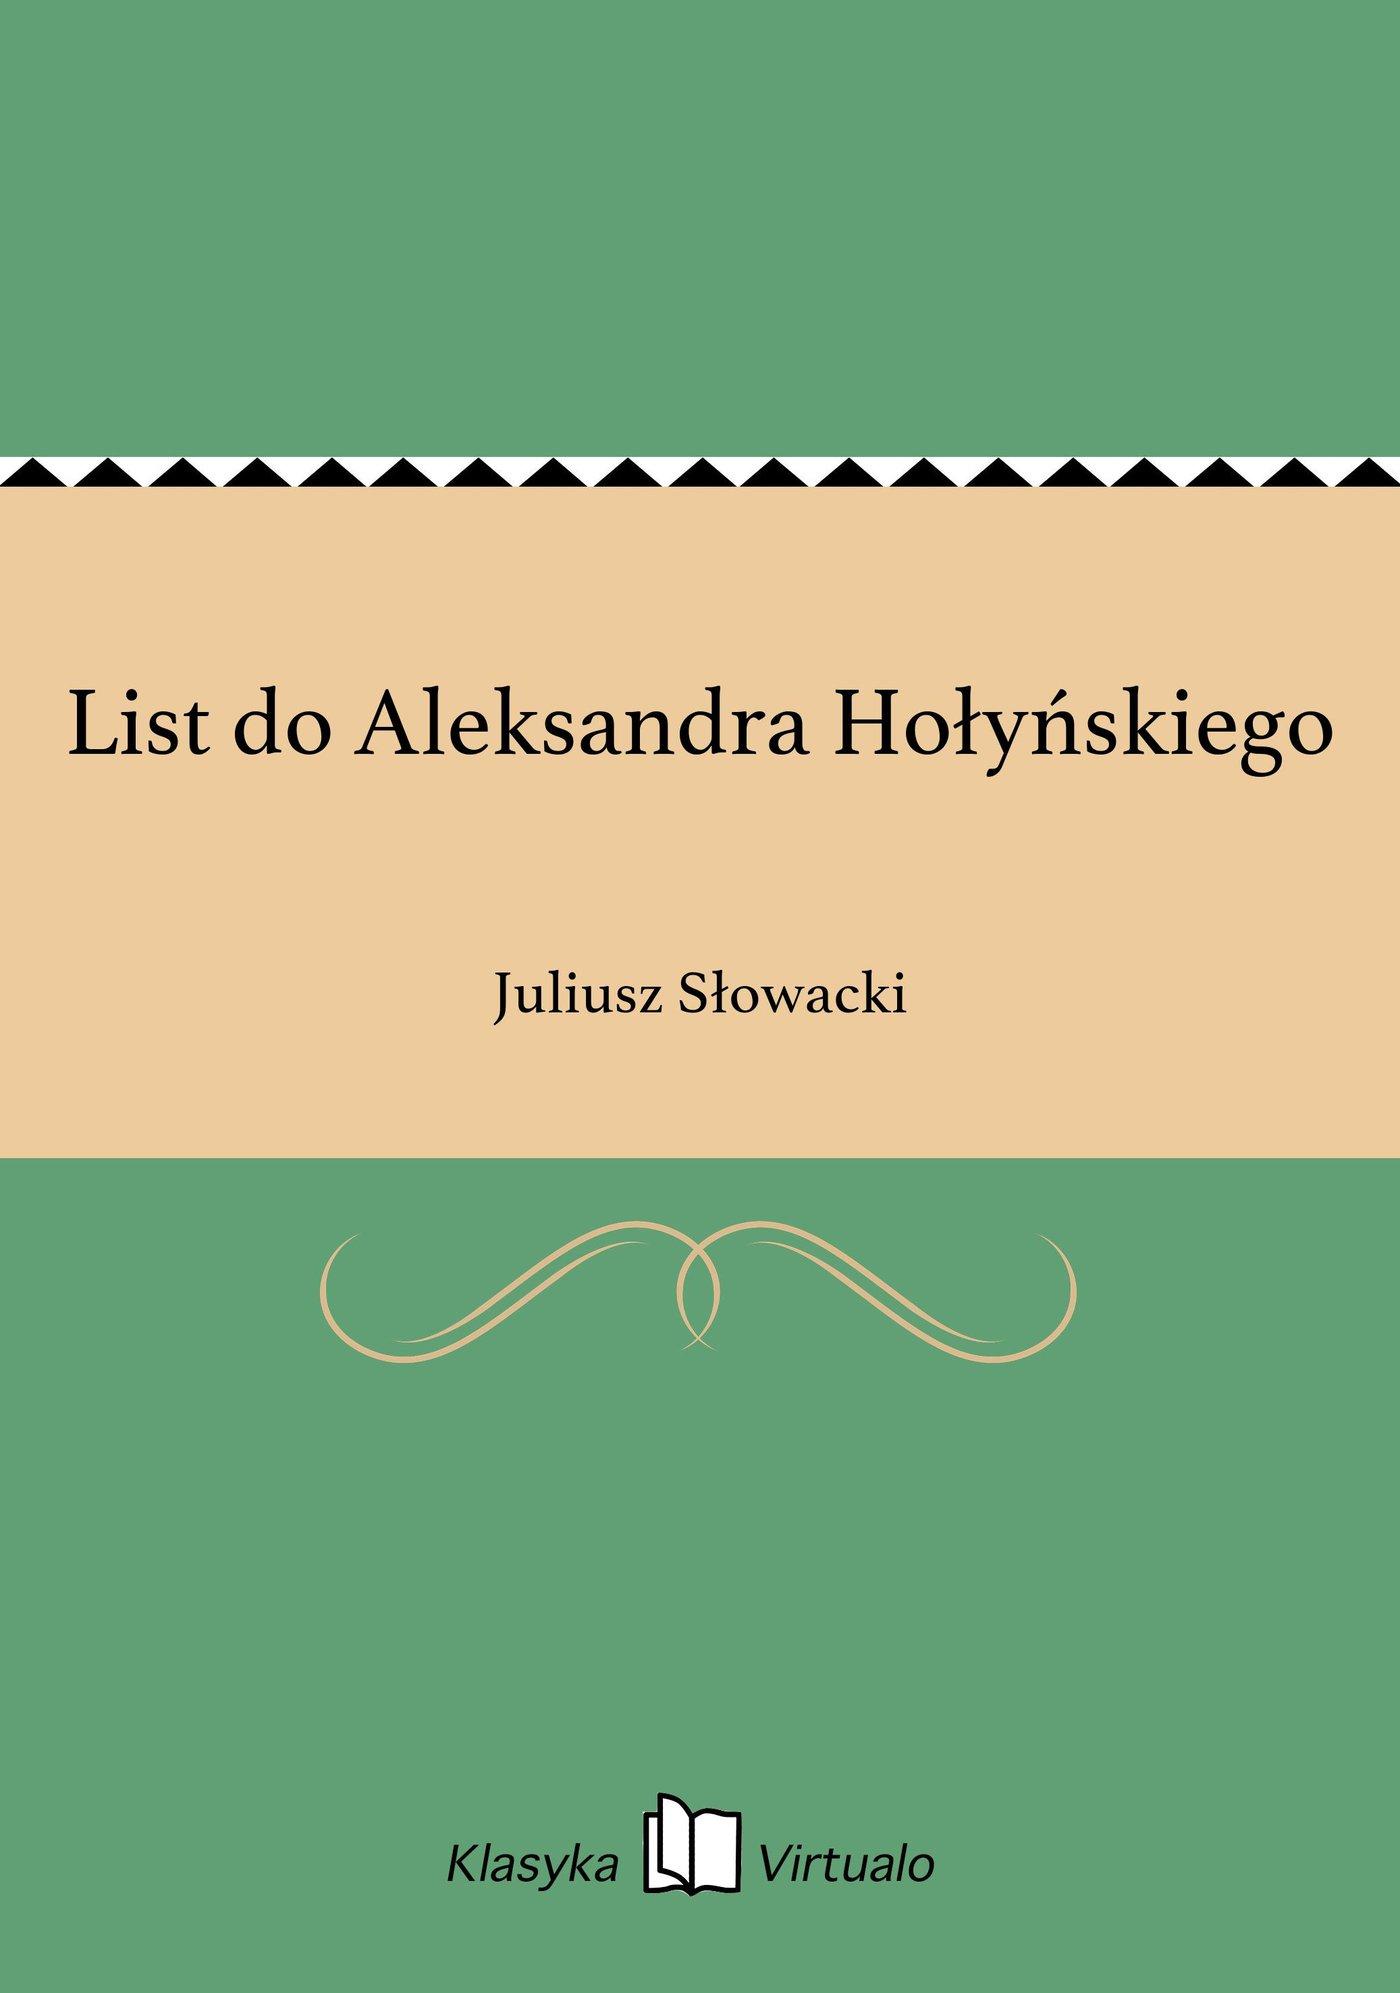 List do Aleksandra Hołyńskiego - Ebook (Książka EPUB) do pobrania w formacie EPUB